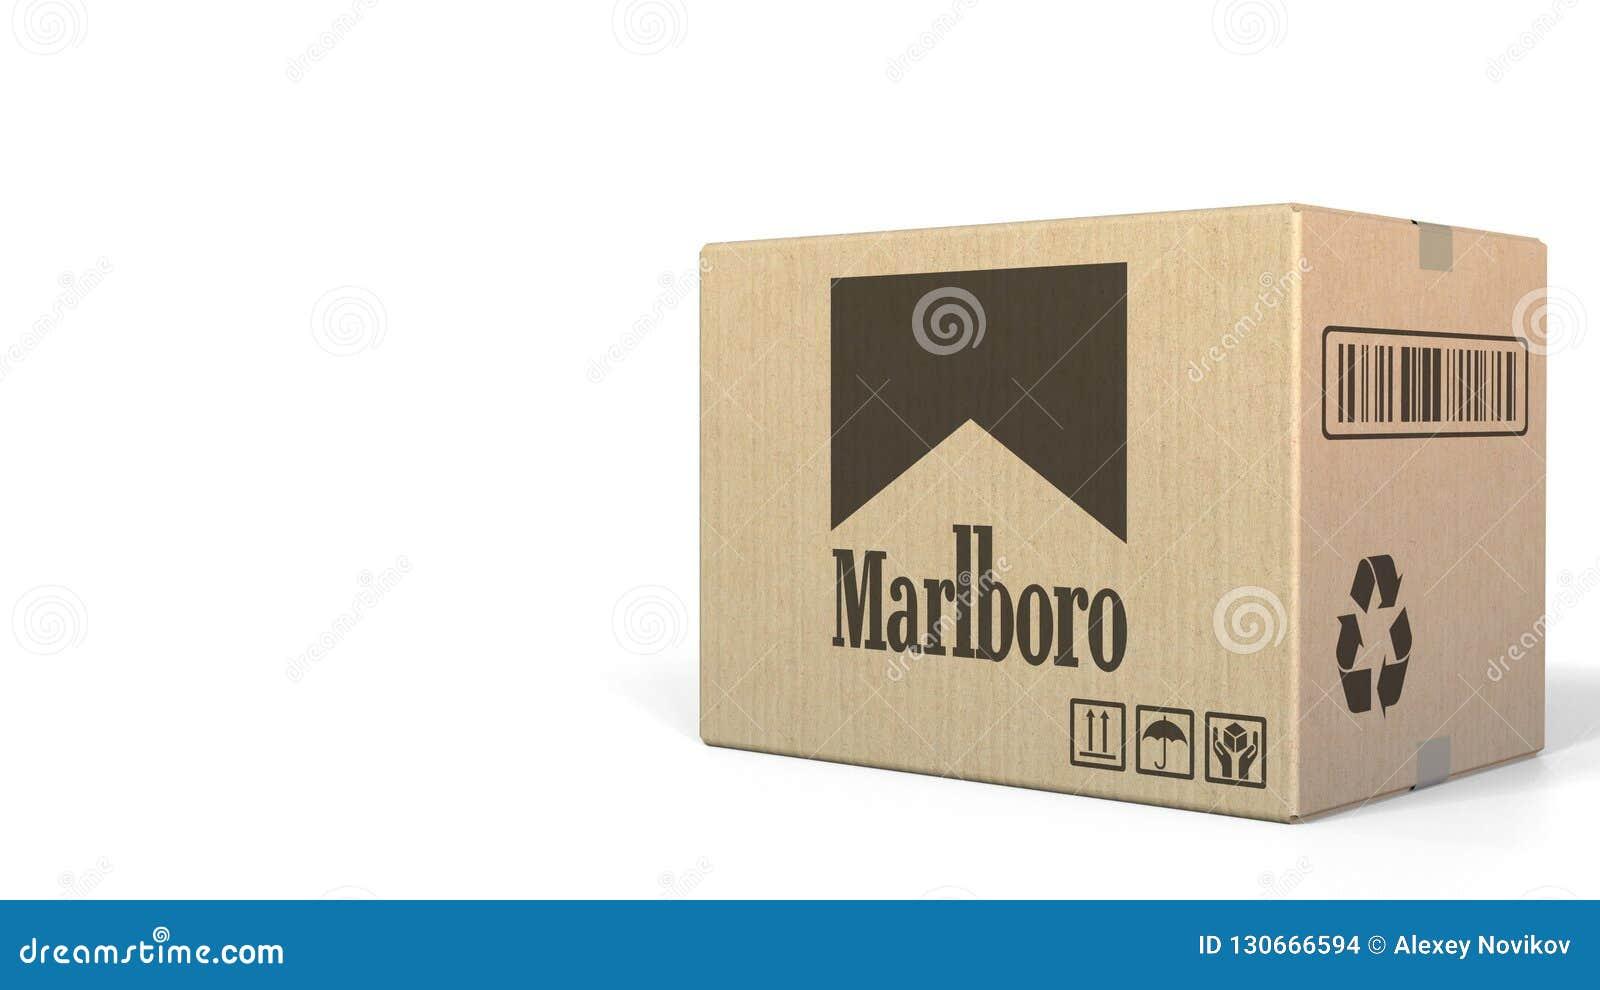 Marlboro 5 Kartons